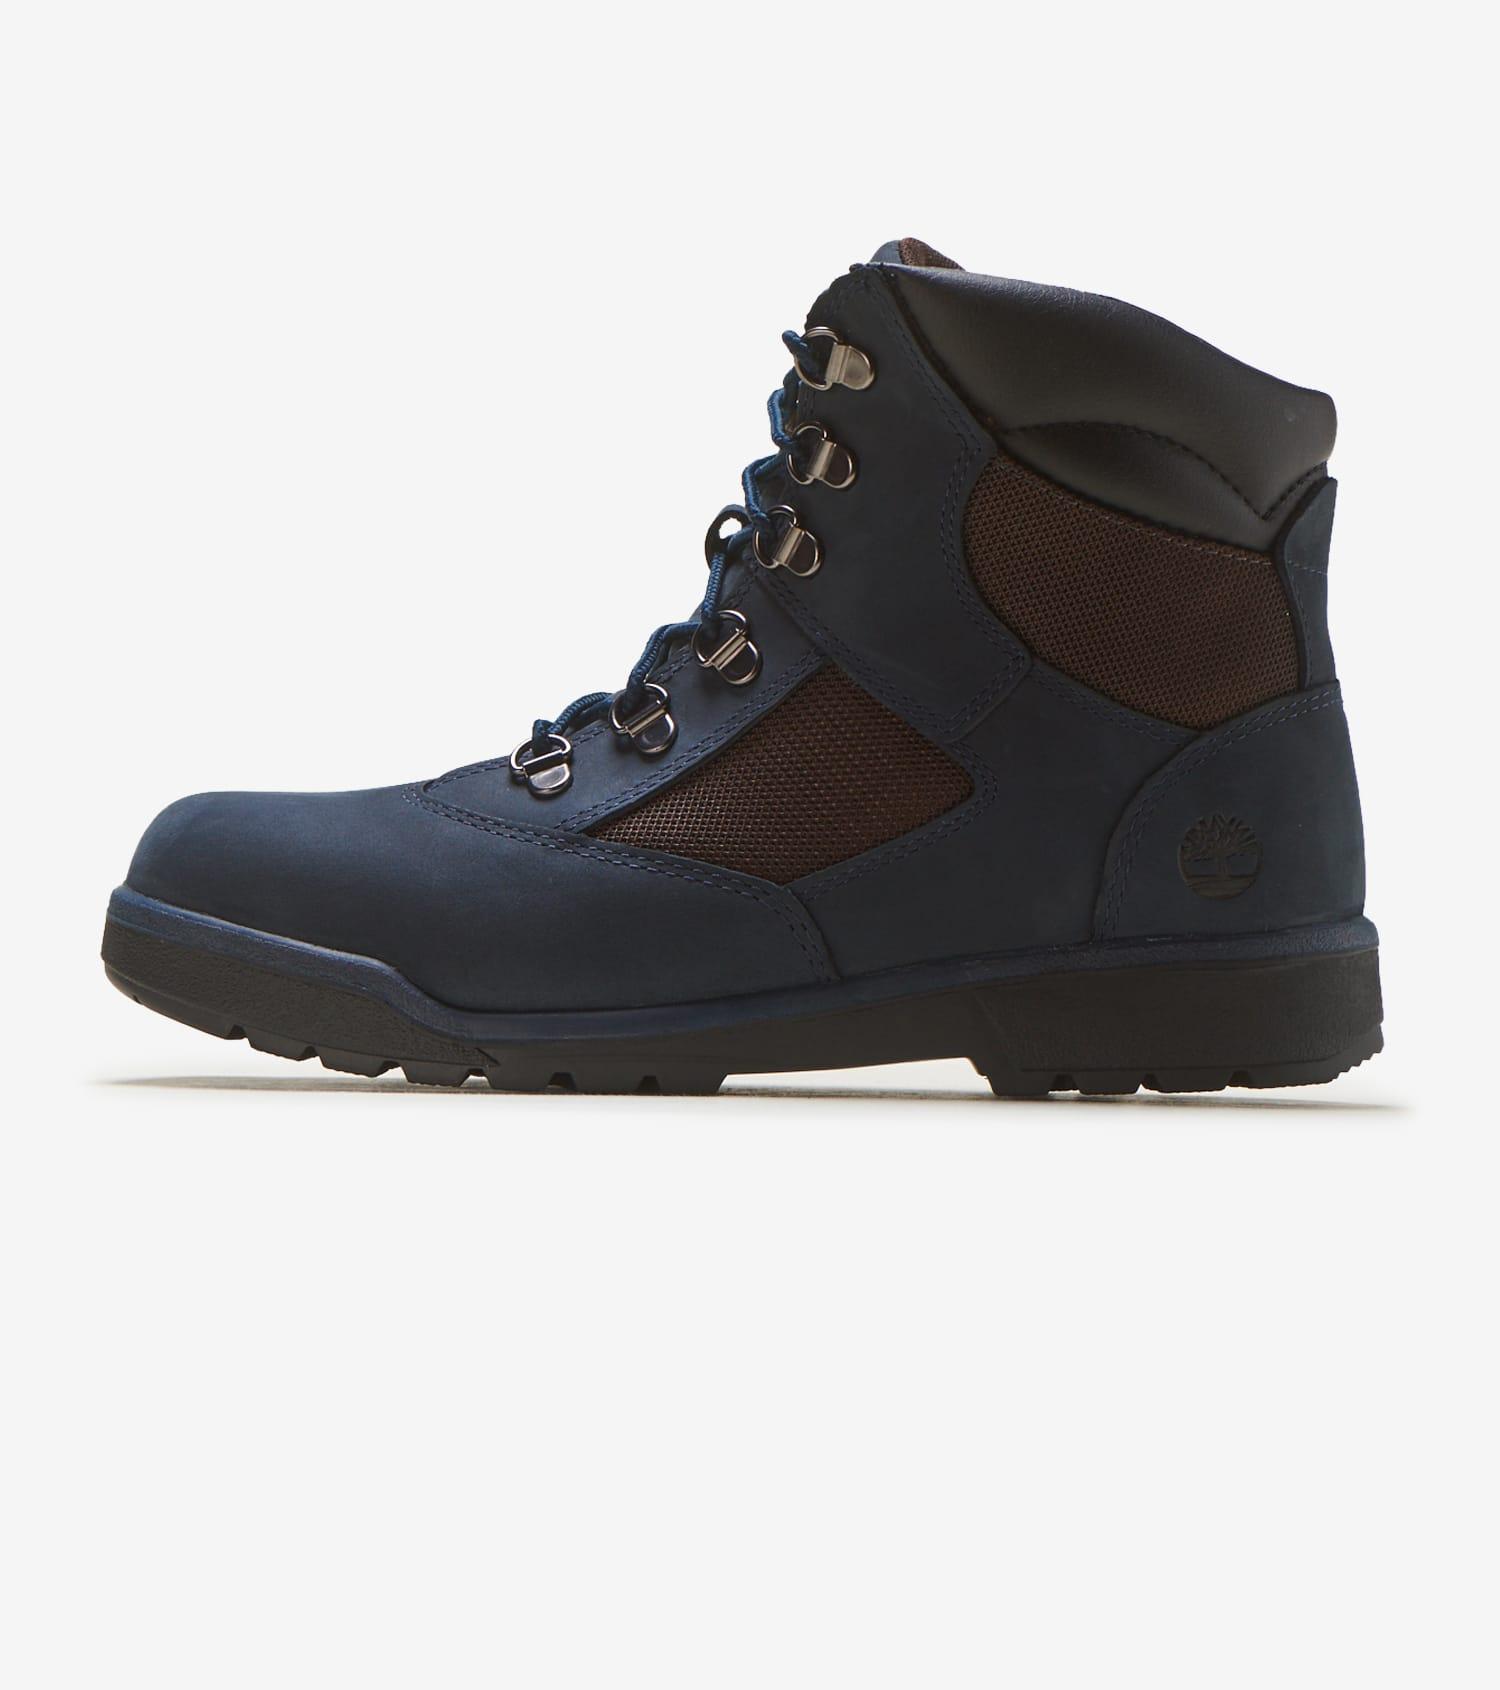 Timberland Grade School 6 Inch Field Boots (Dark Grey | Navy)